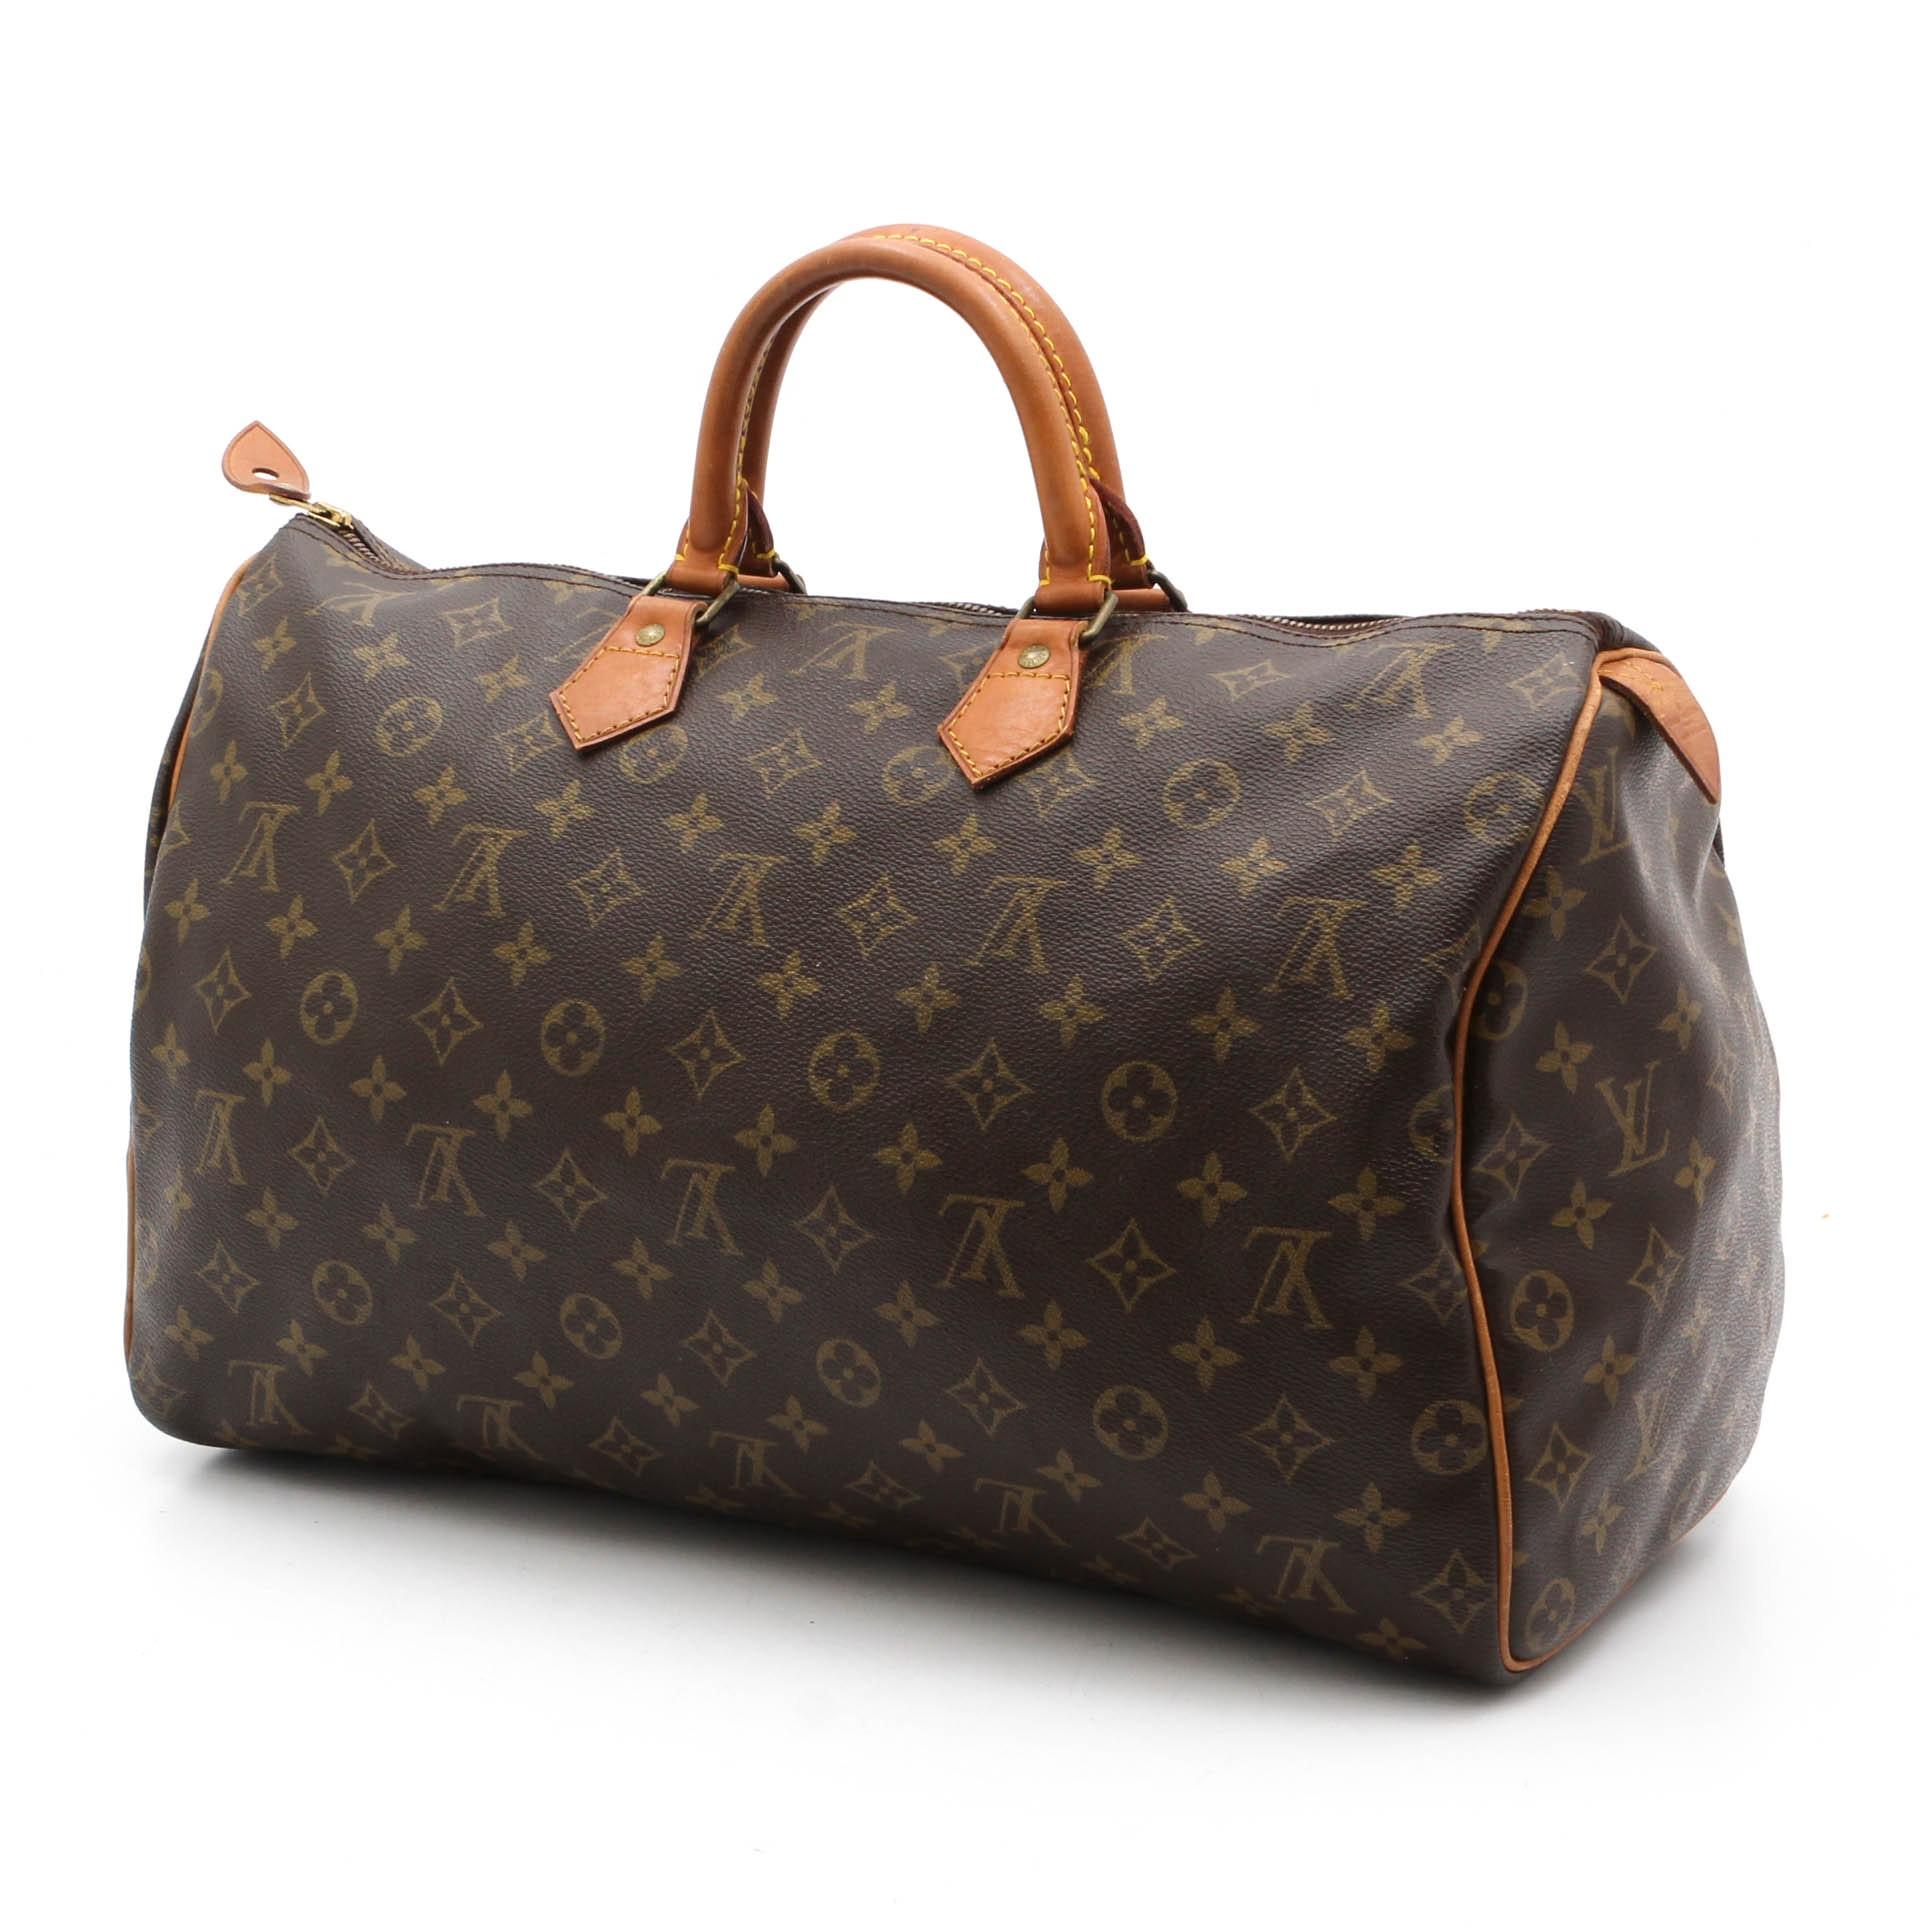 Louis Vuitton of Paris Speedy 40 Monogram Handbag